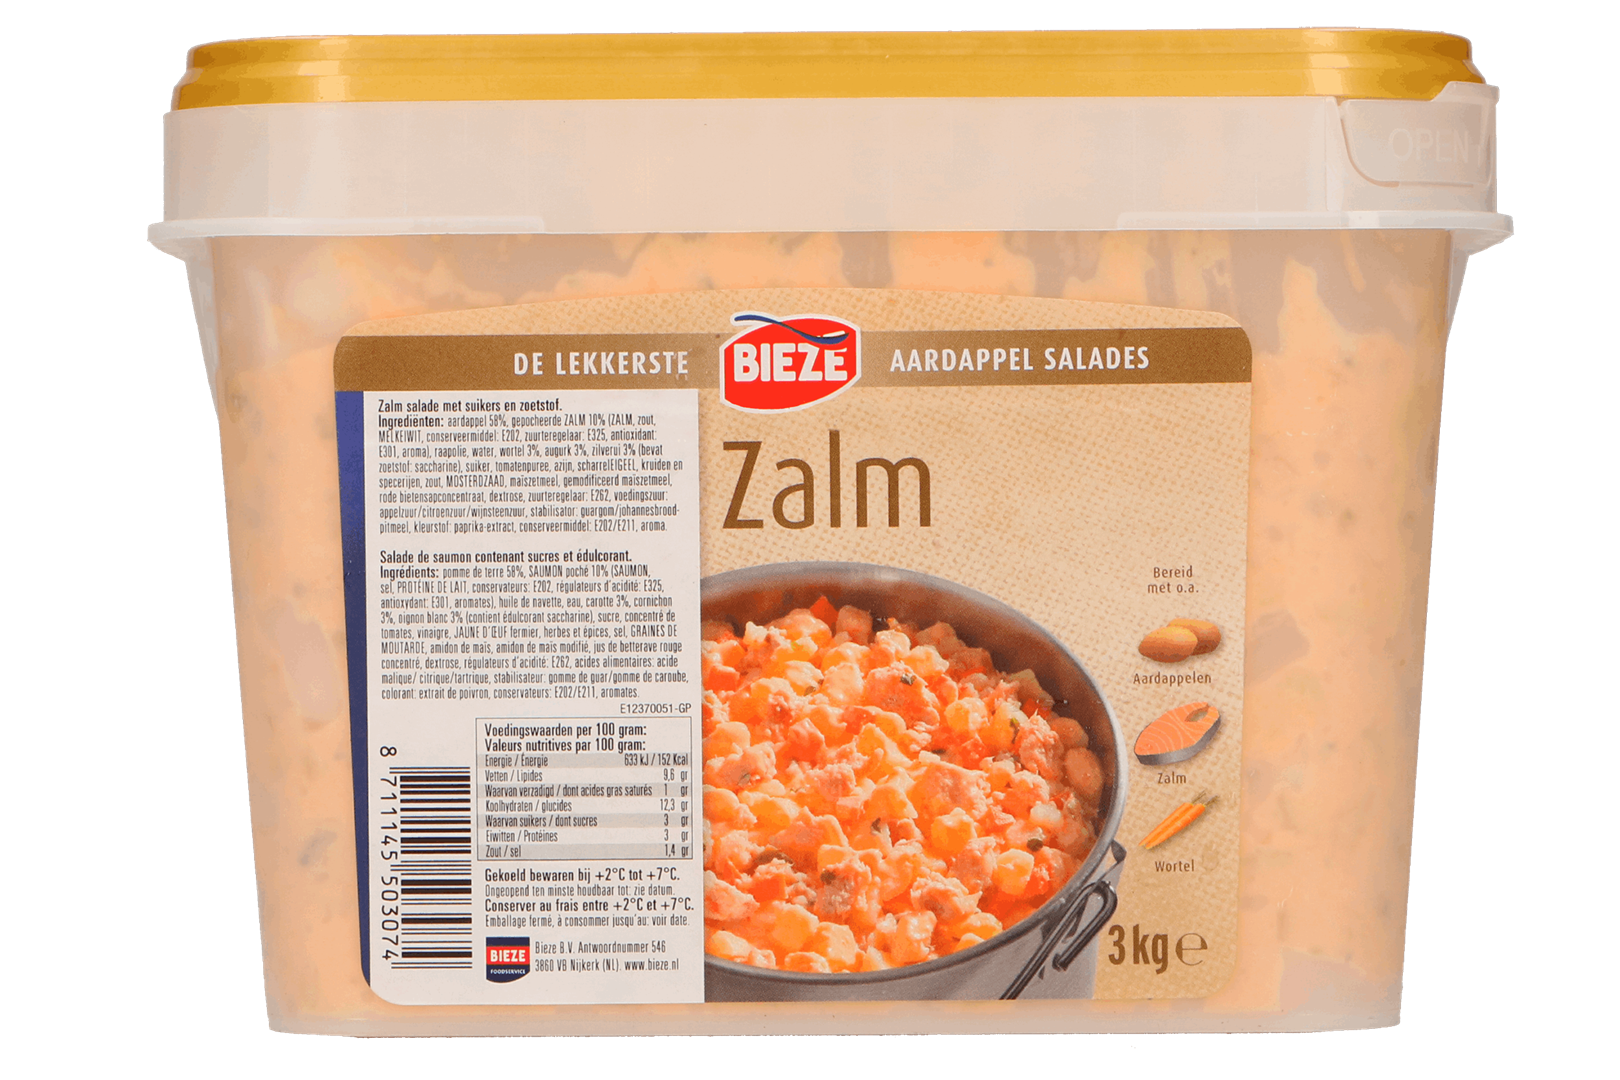 Productafbeelding Zalm aardappel salade 3kg